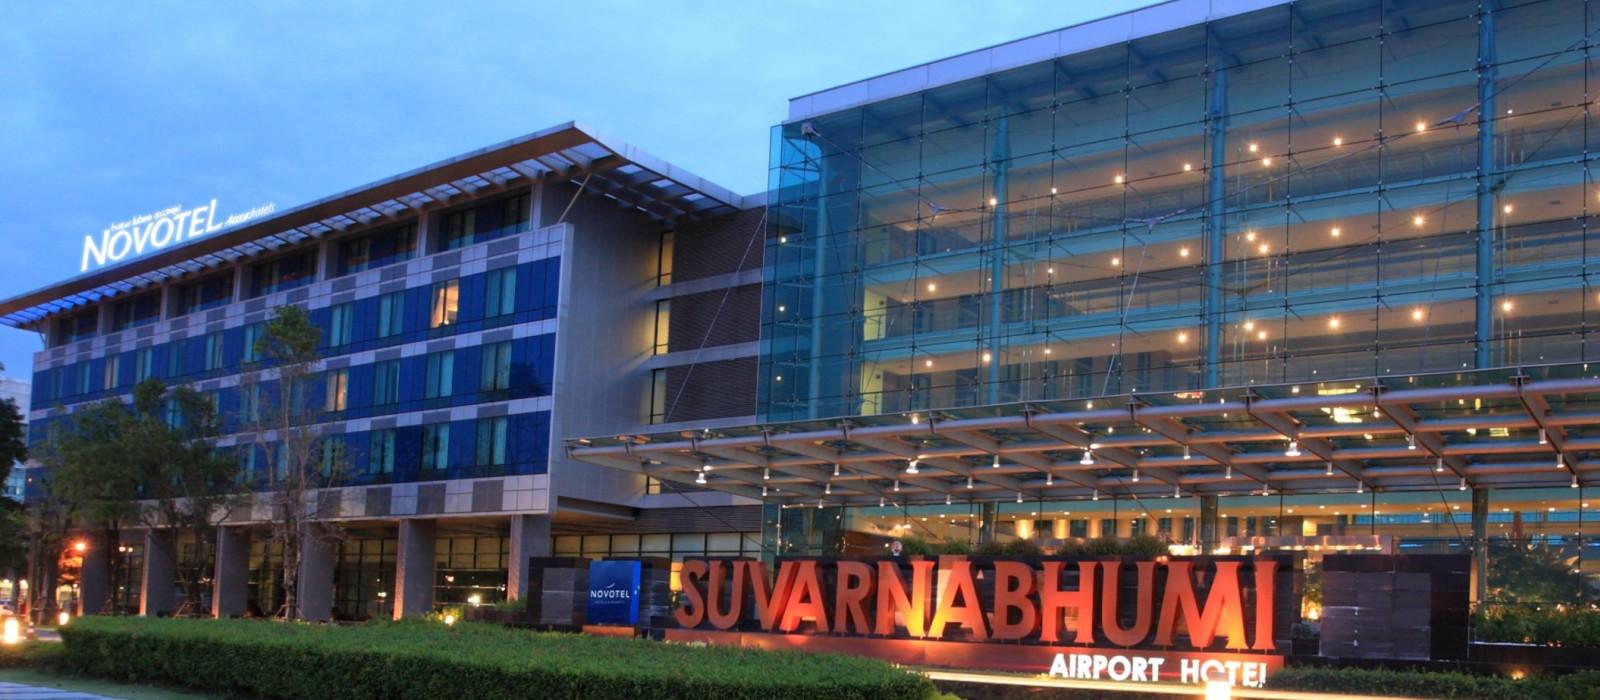 Hotel Novotel Bangkok Suvarnabhumi Airport Thailand